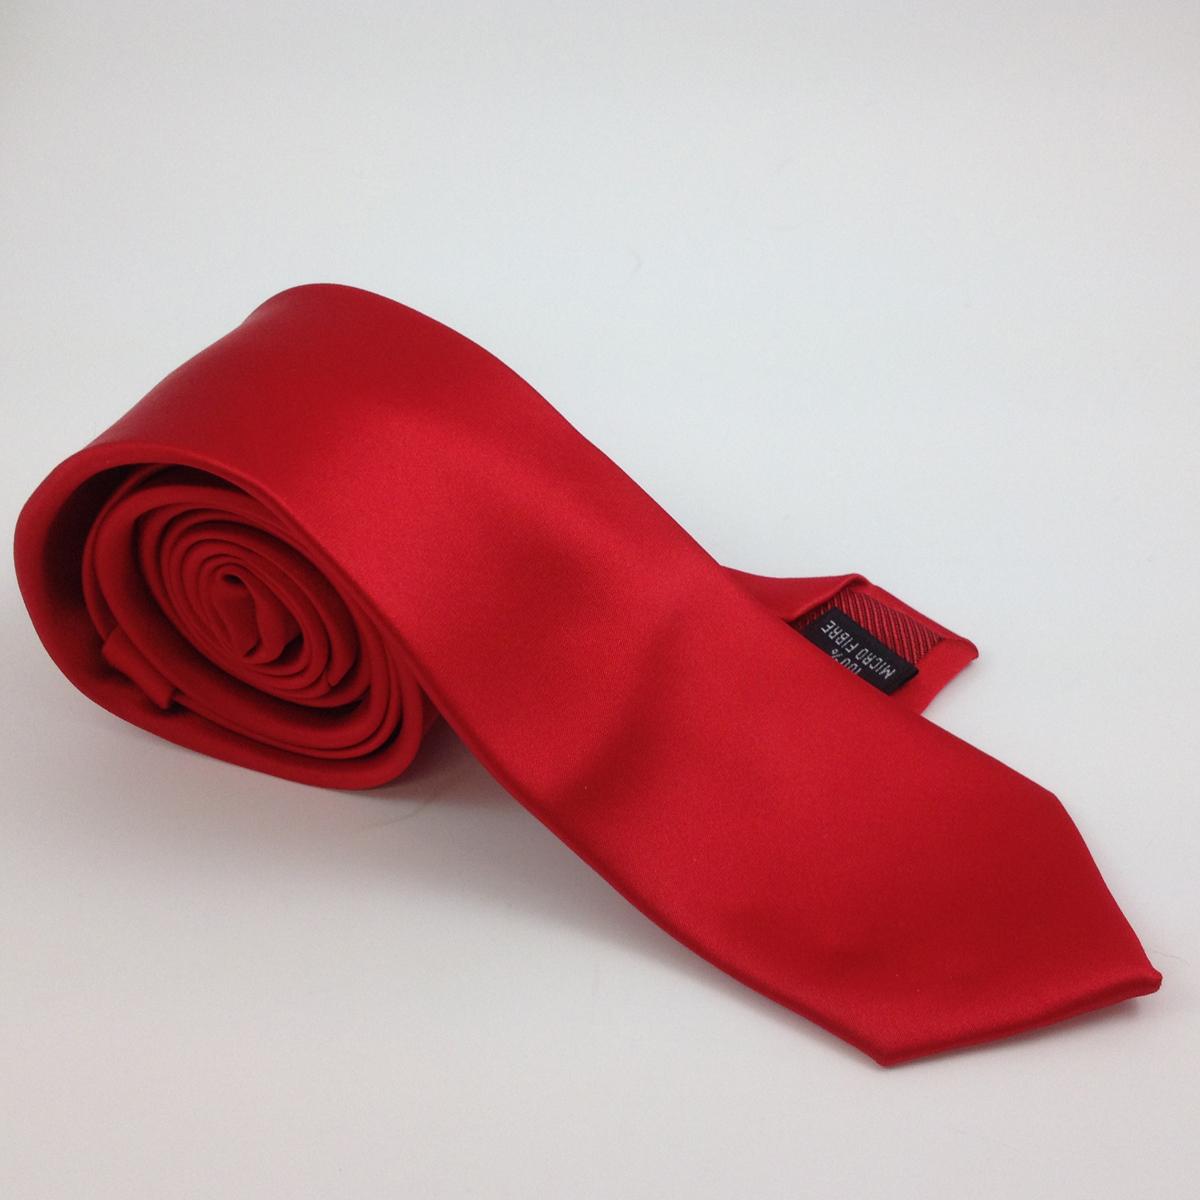 satin plain red q mens ties facemasks con murphys menswear cork - - Con Murphys Menswear